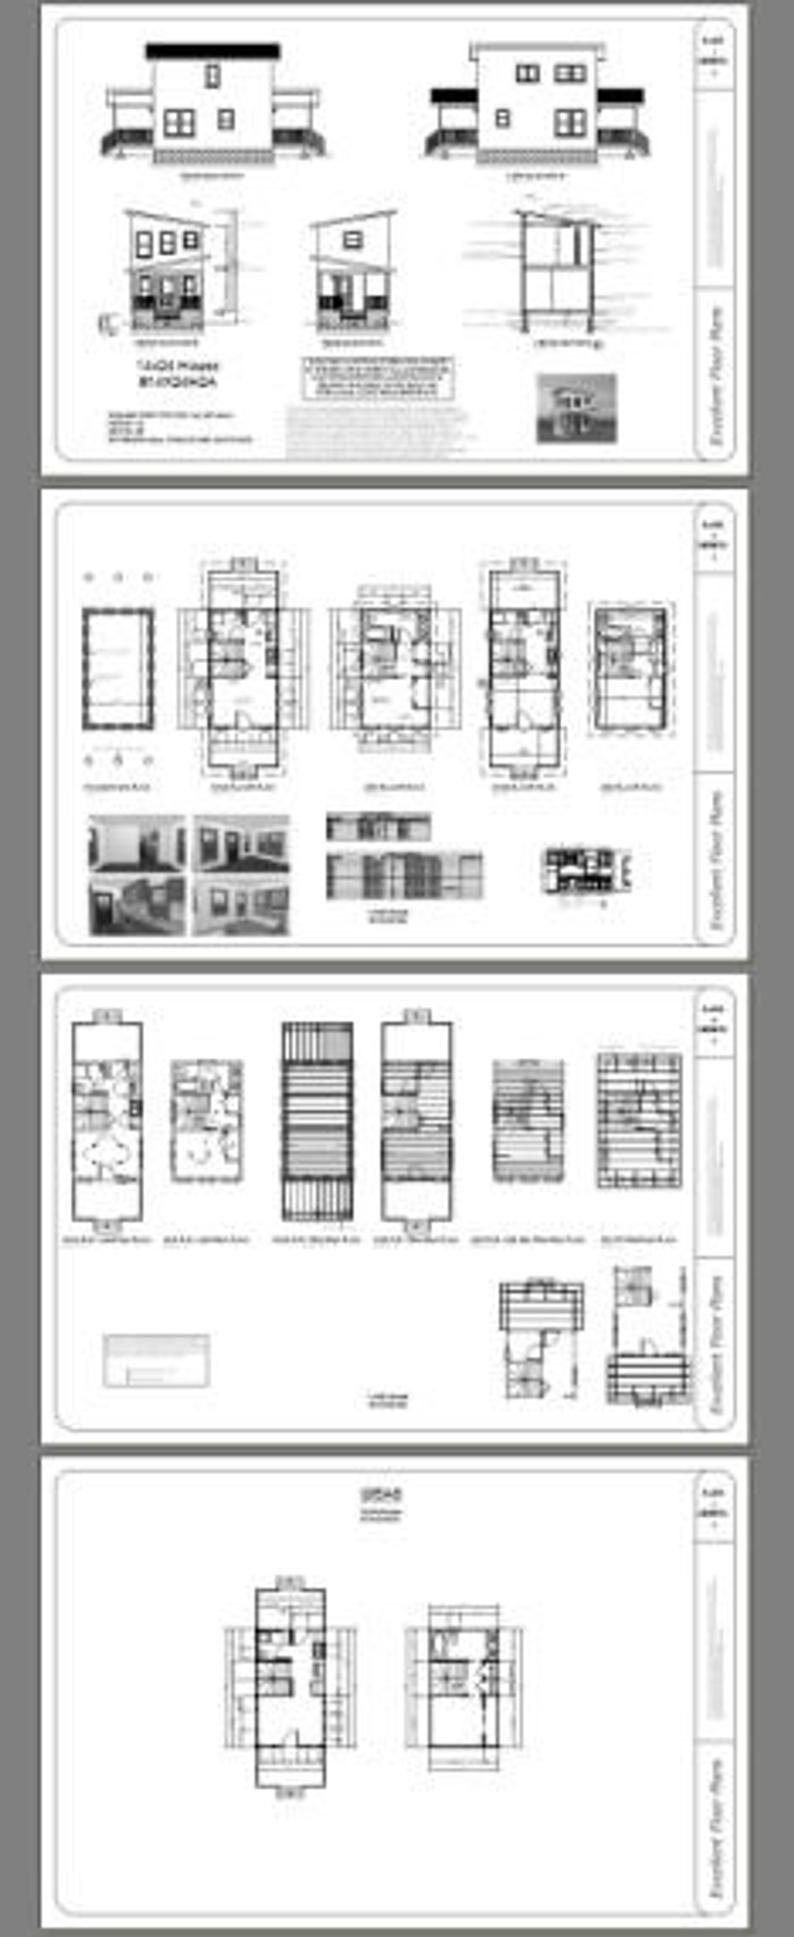 14x24 House 1Bedroom 1.5Bath 597 sq ft PDF Floor Etsy